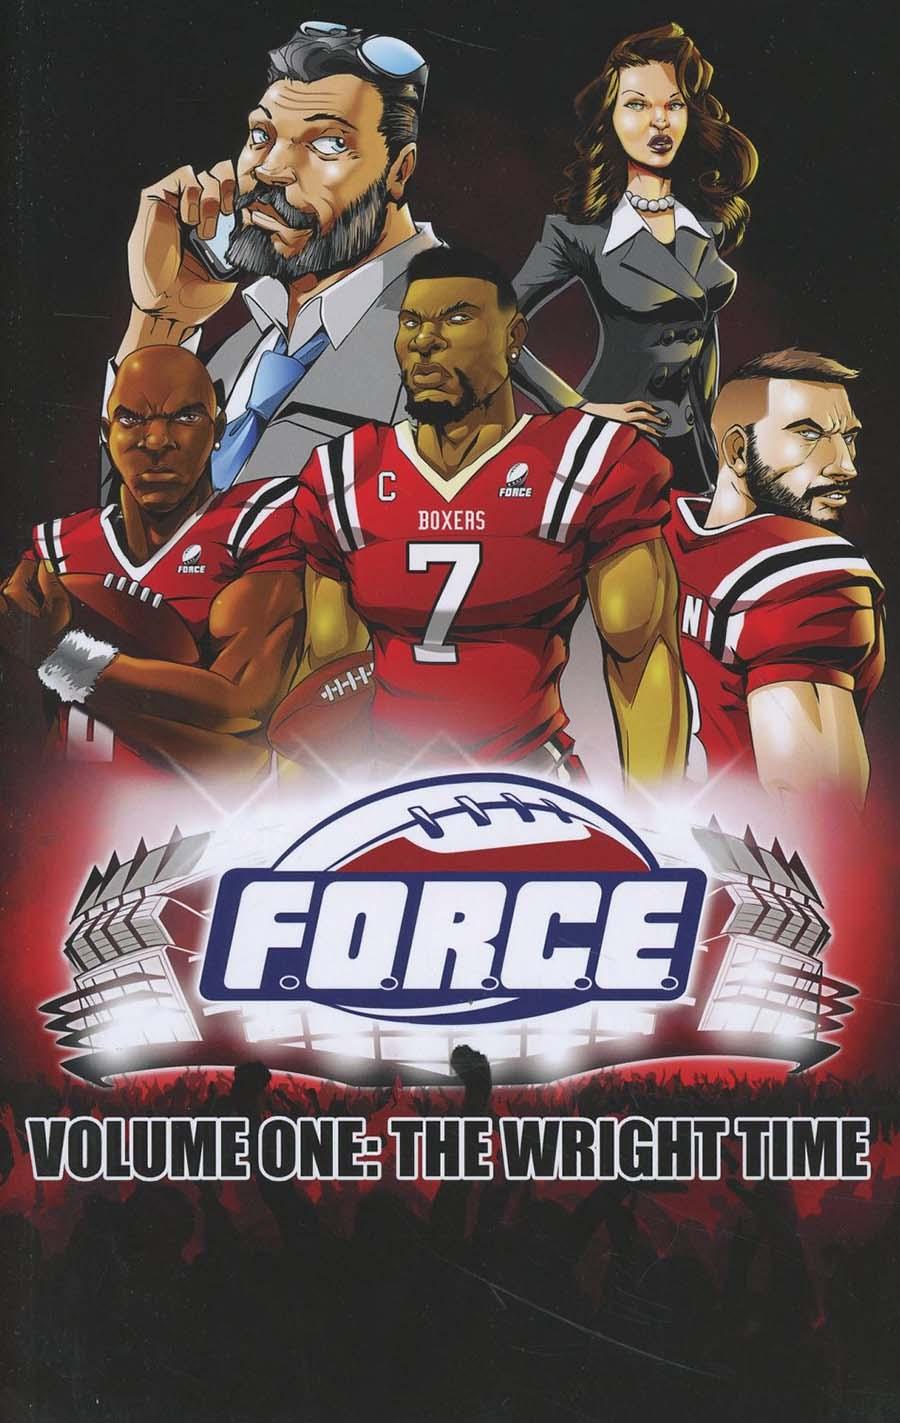 F.O.R.C.E. Vol 1 Wright Time TP